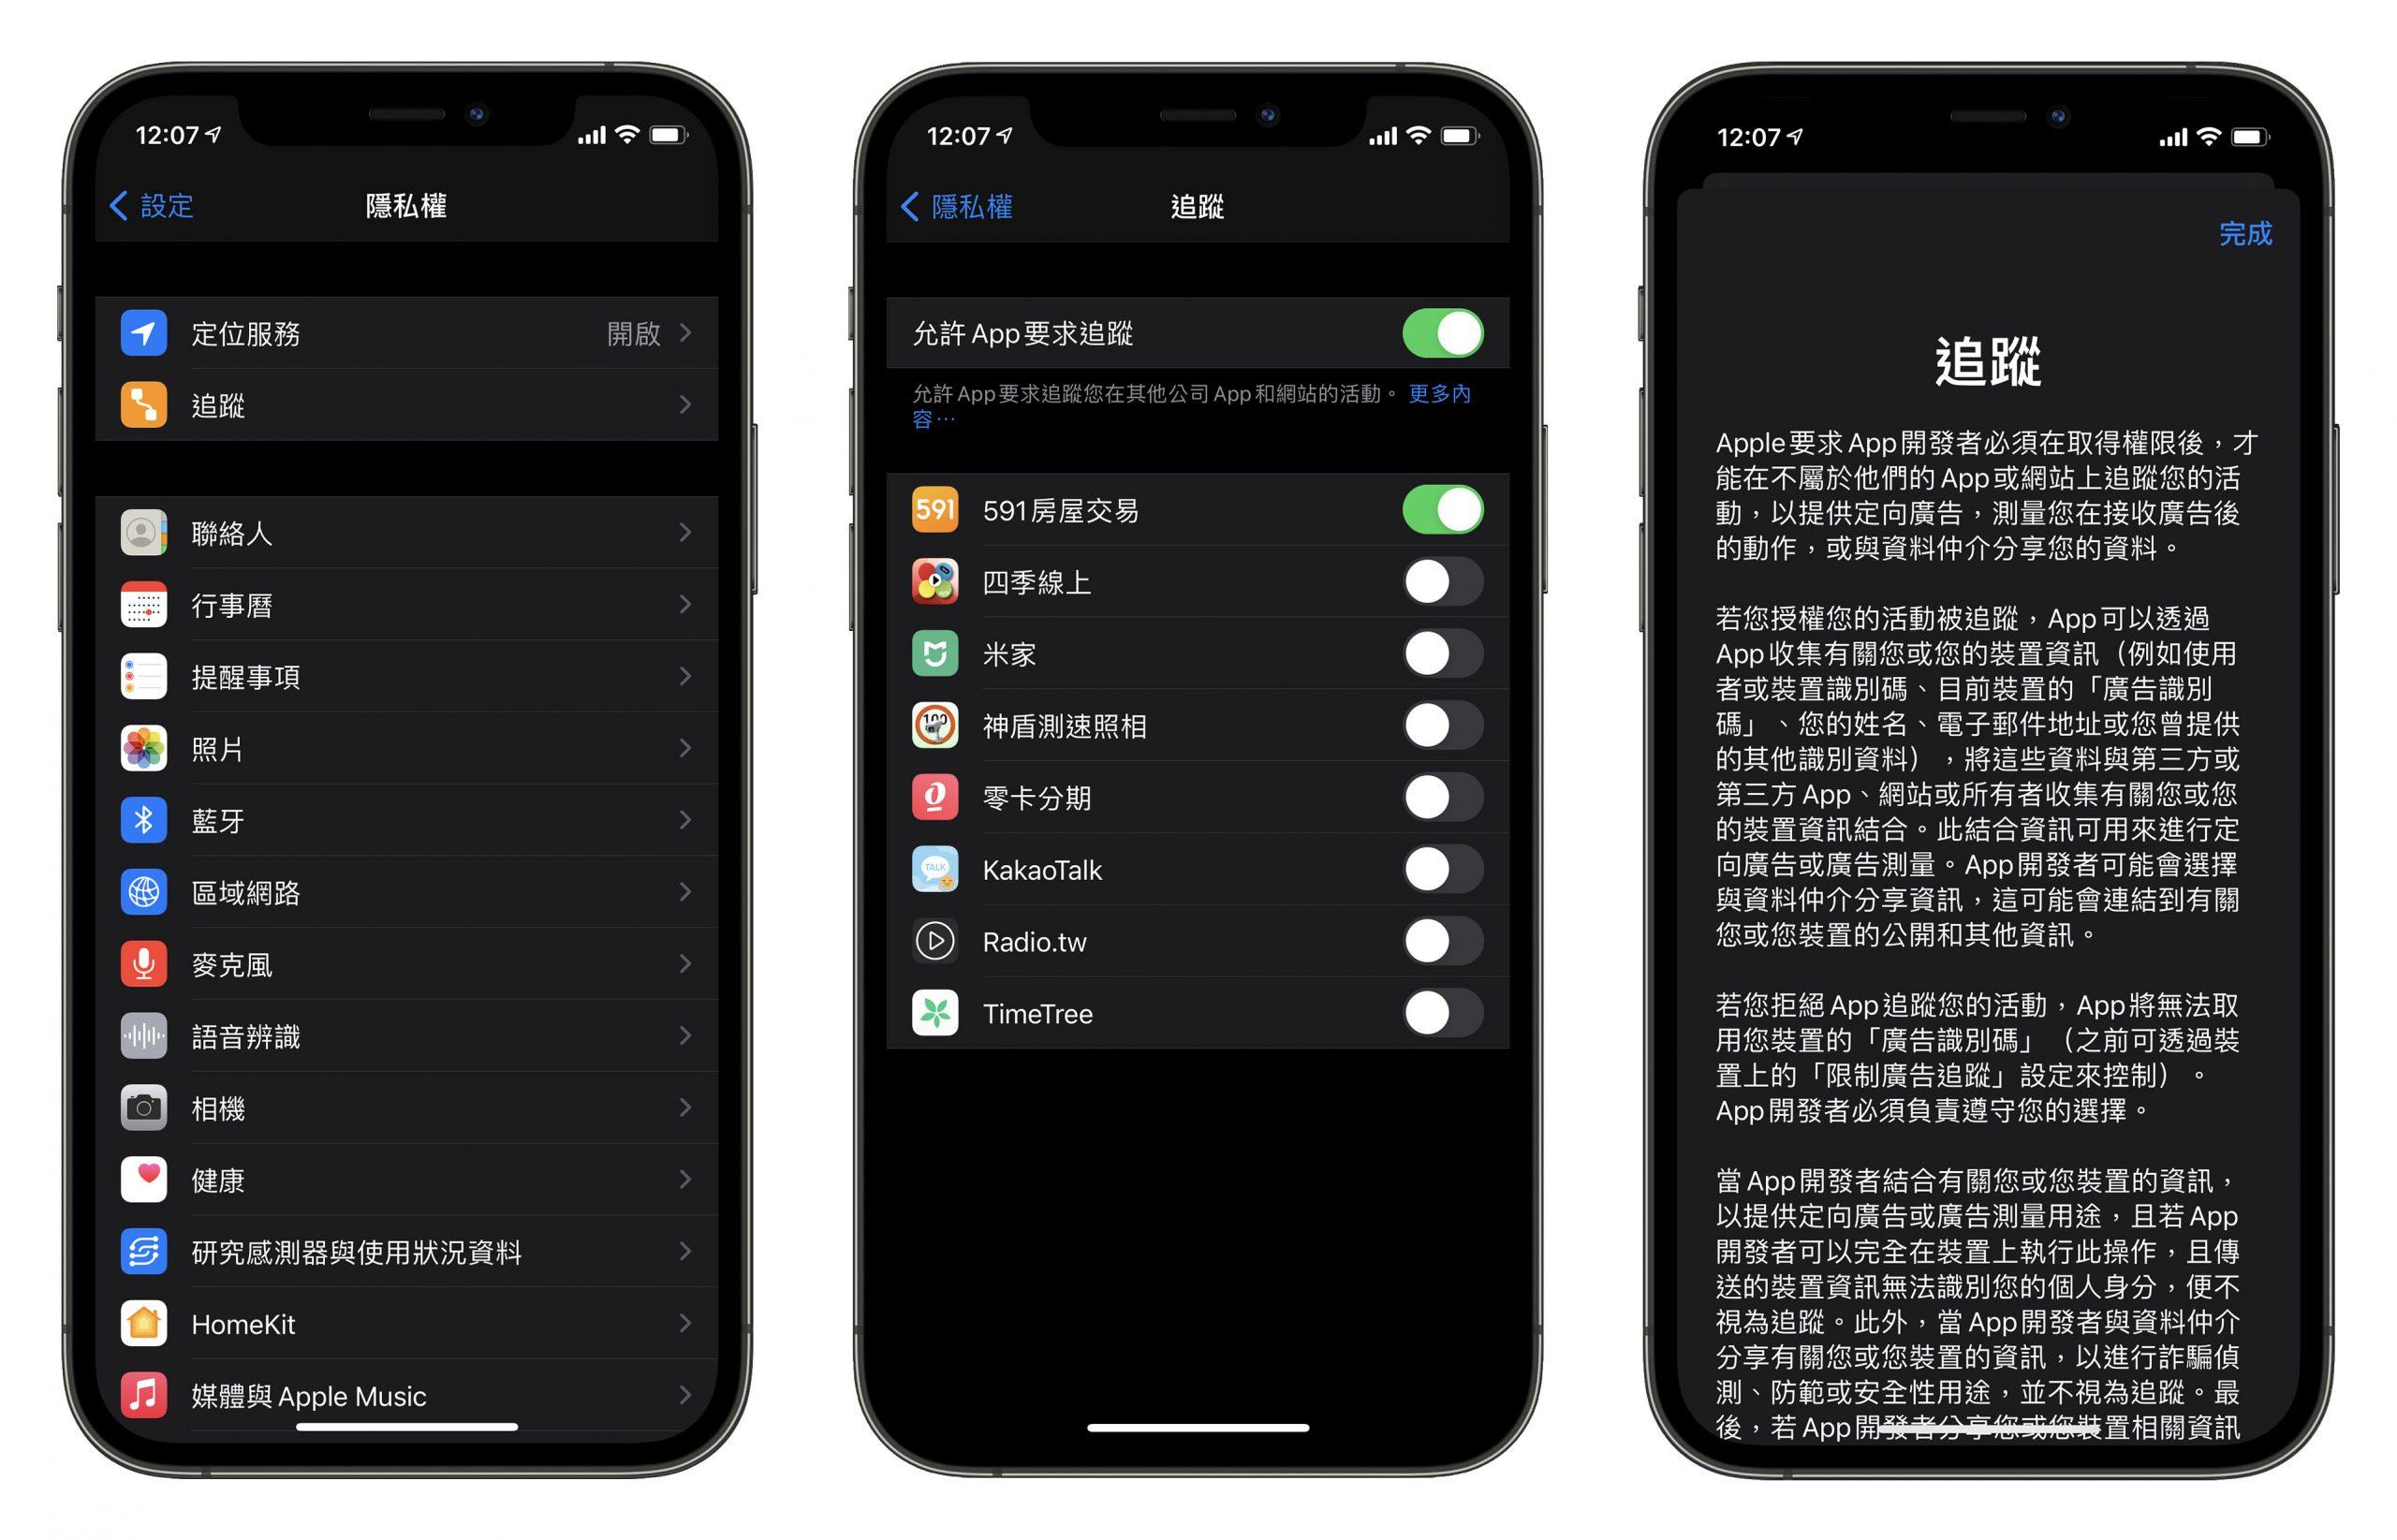 iOS 14.5、隱私權、App 追蹤